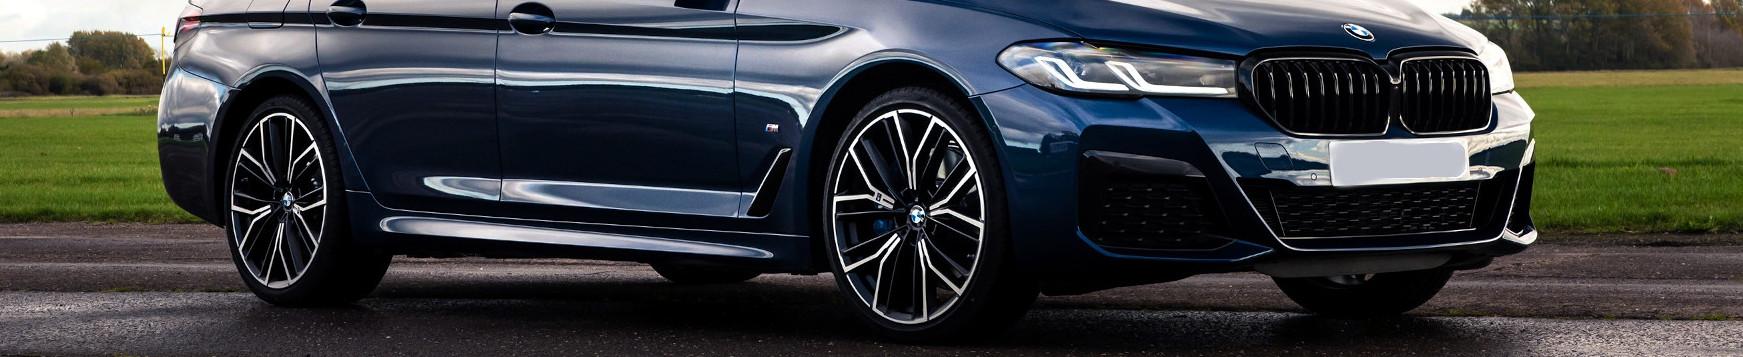 Полировка фар BMW